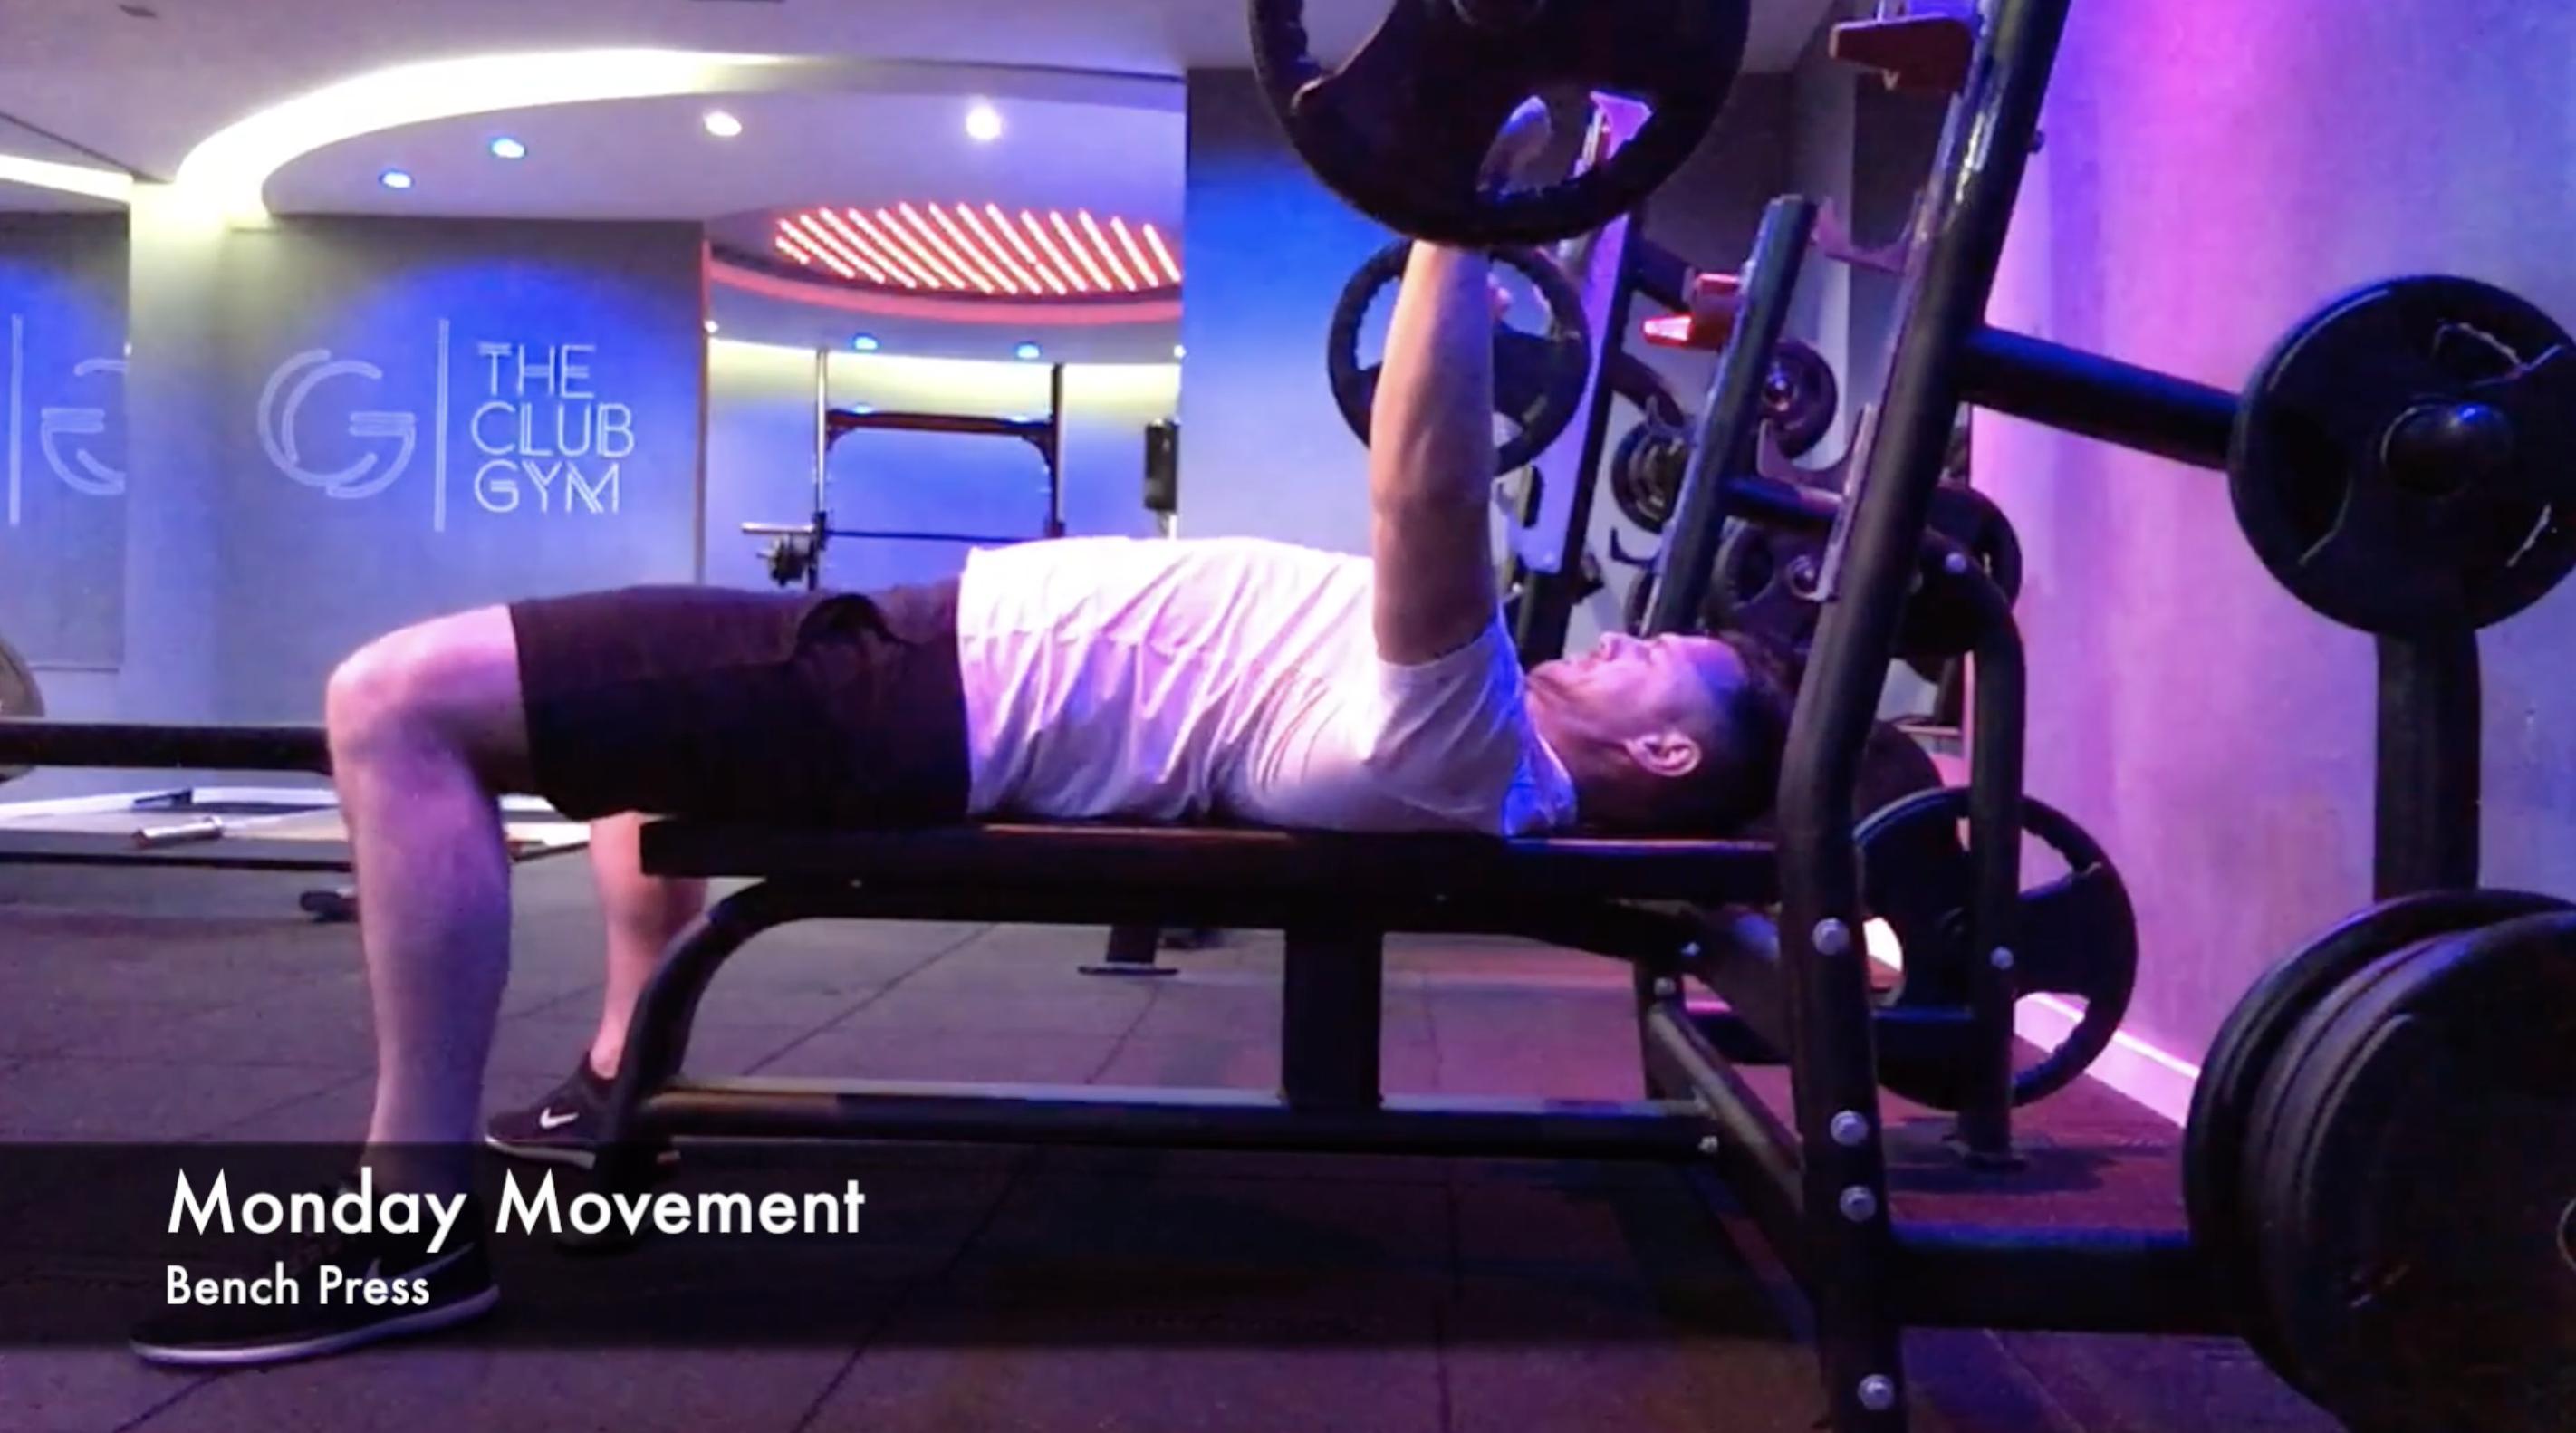 The Club Gym - Bench Press